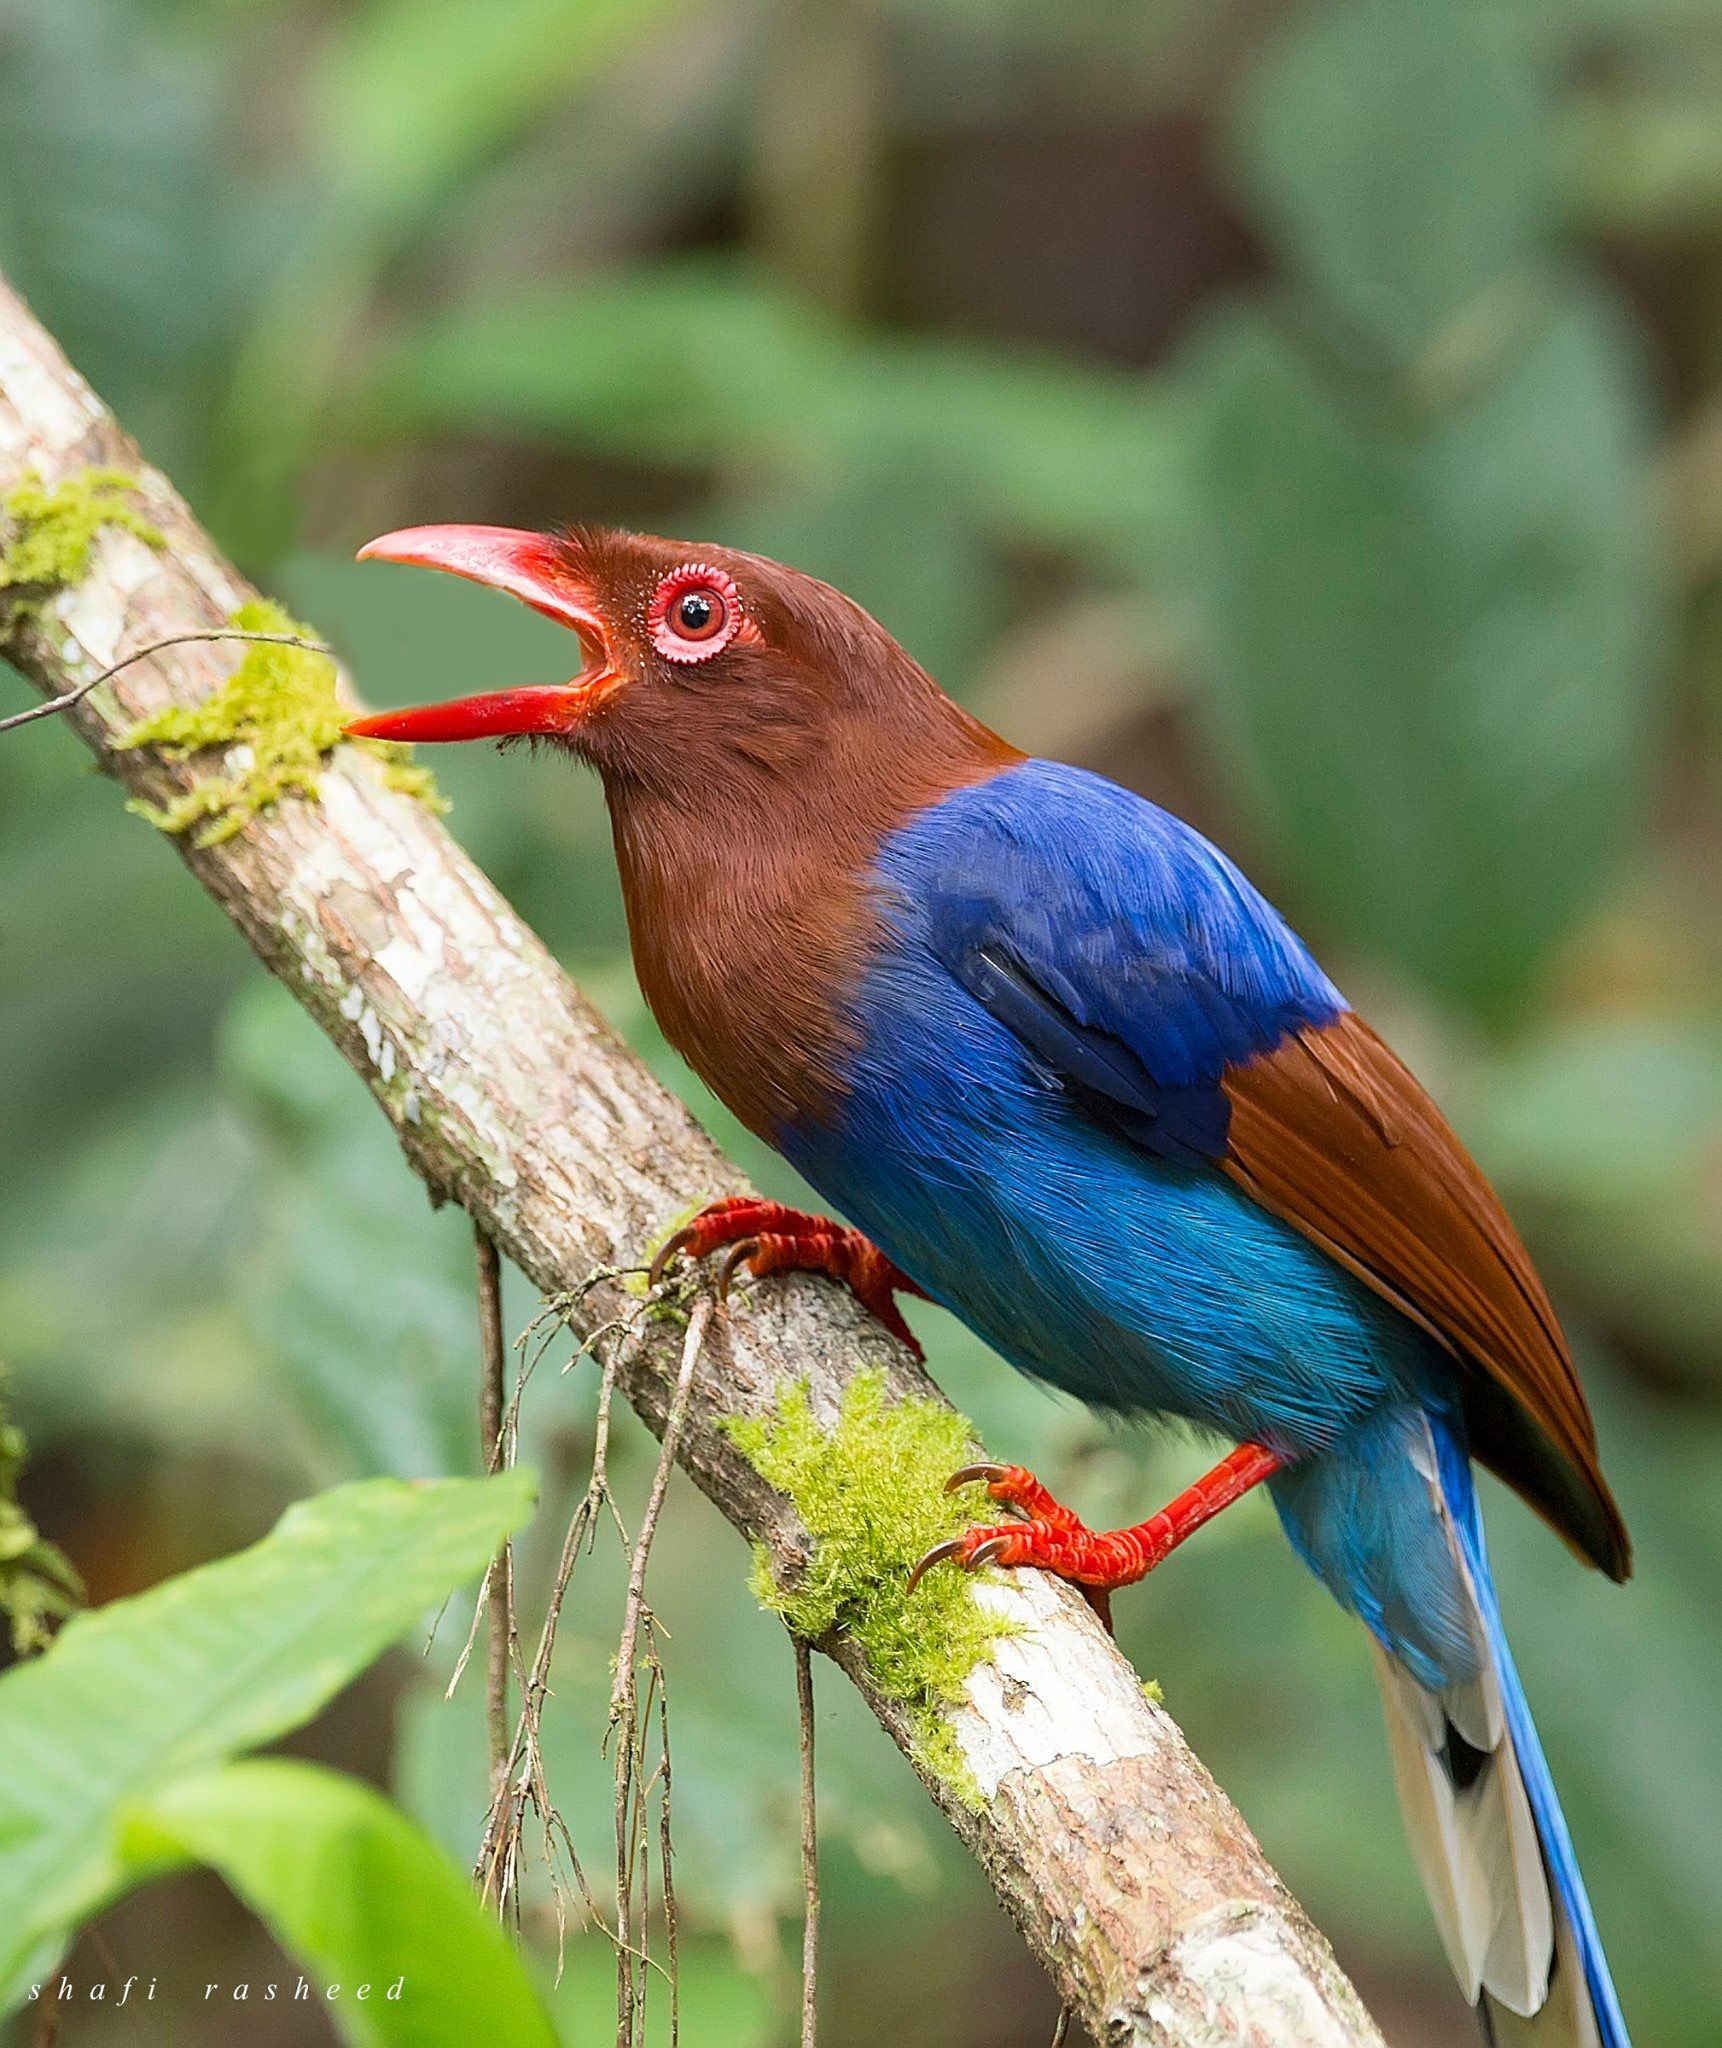 ZAGROS NATURE IMAGES: Sri Lanka Blue Magpie